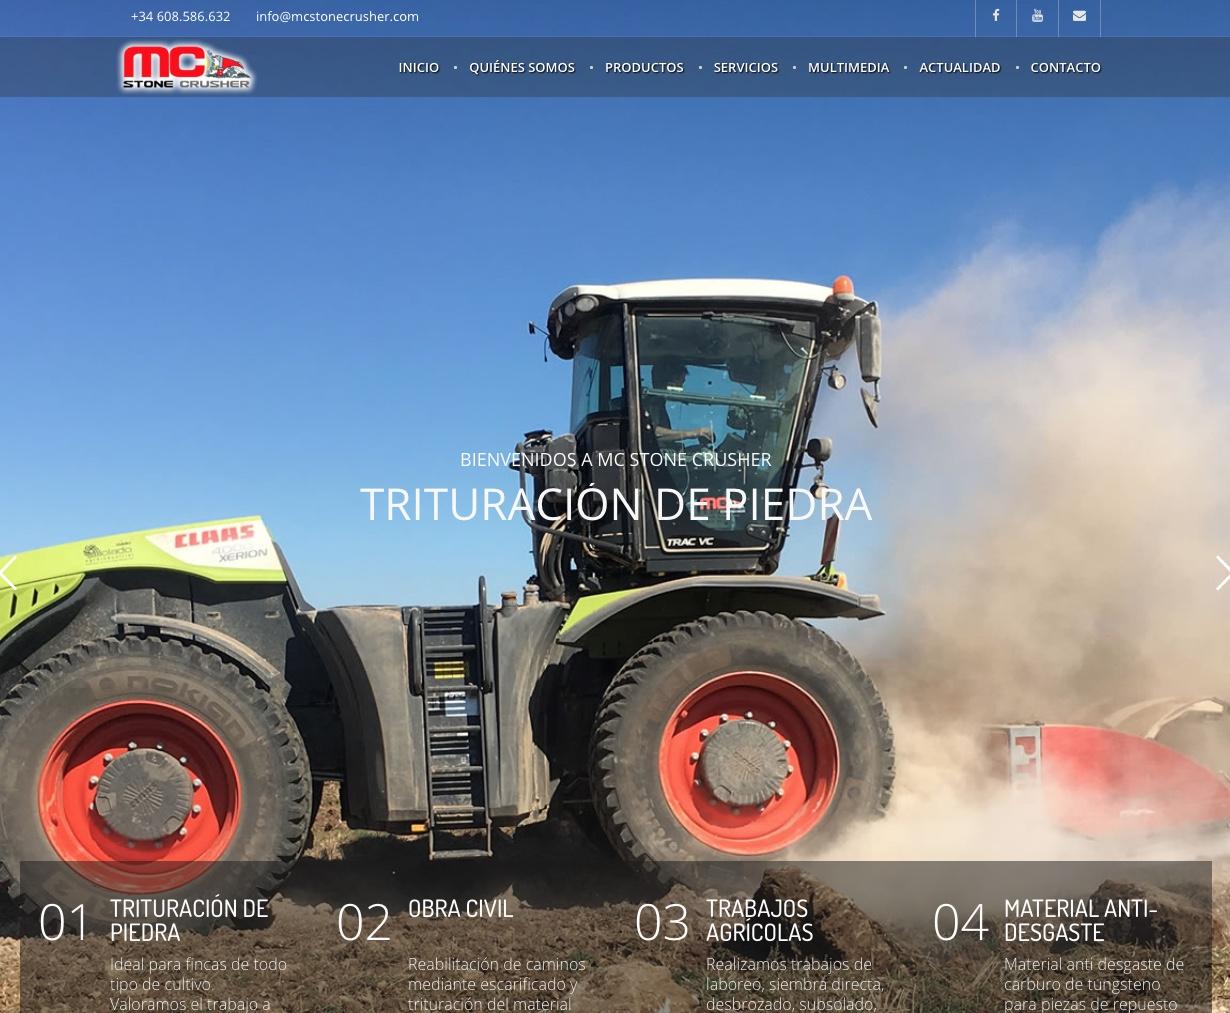 Hemos diseñado la página web de MC Stone Crusher